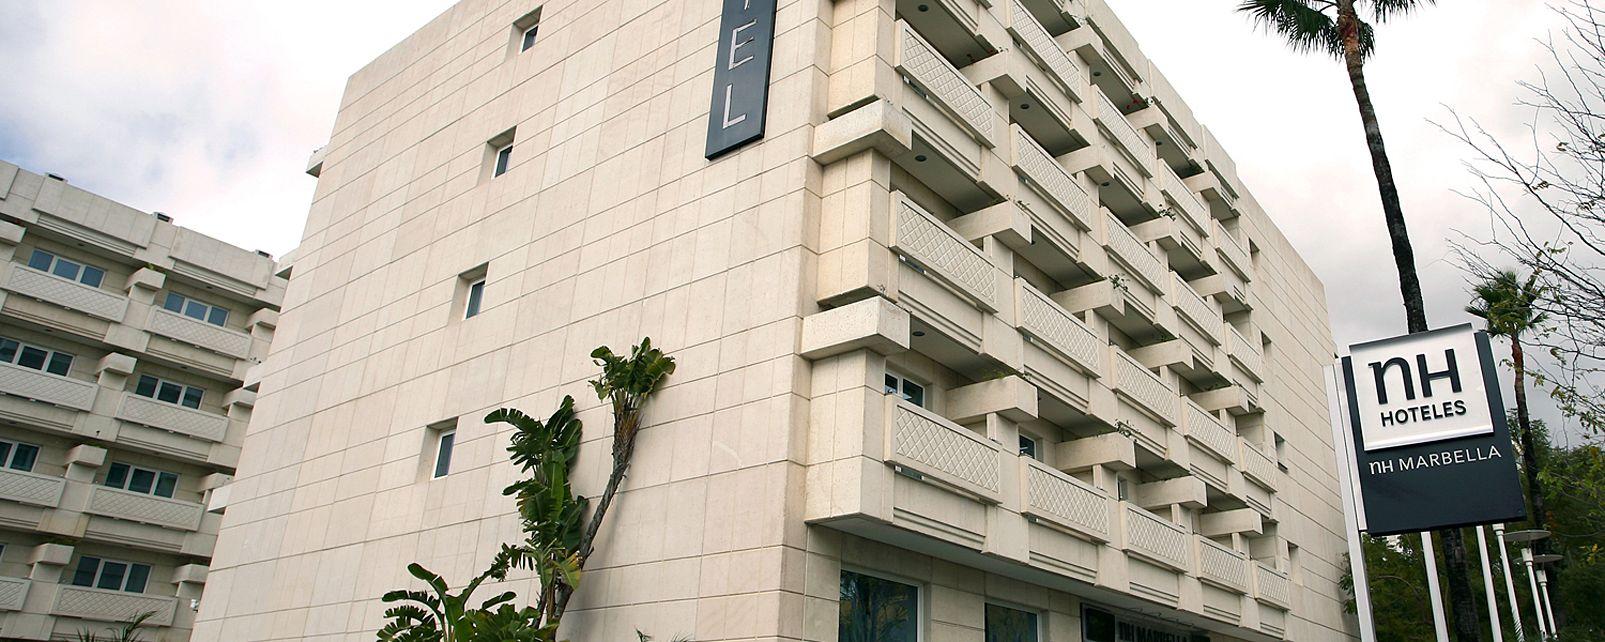 Hôtel NH Marbella